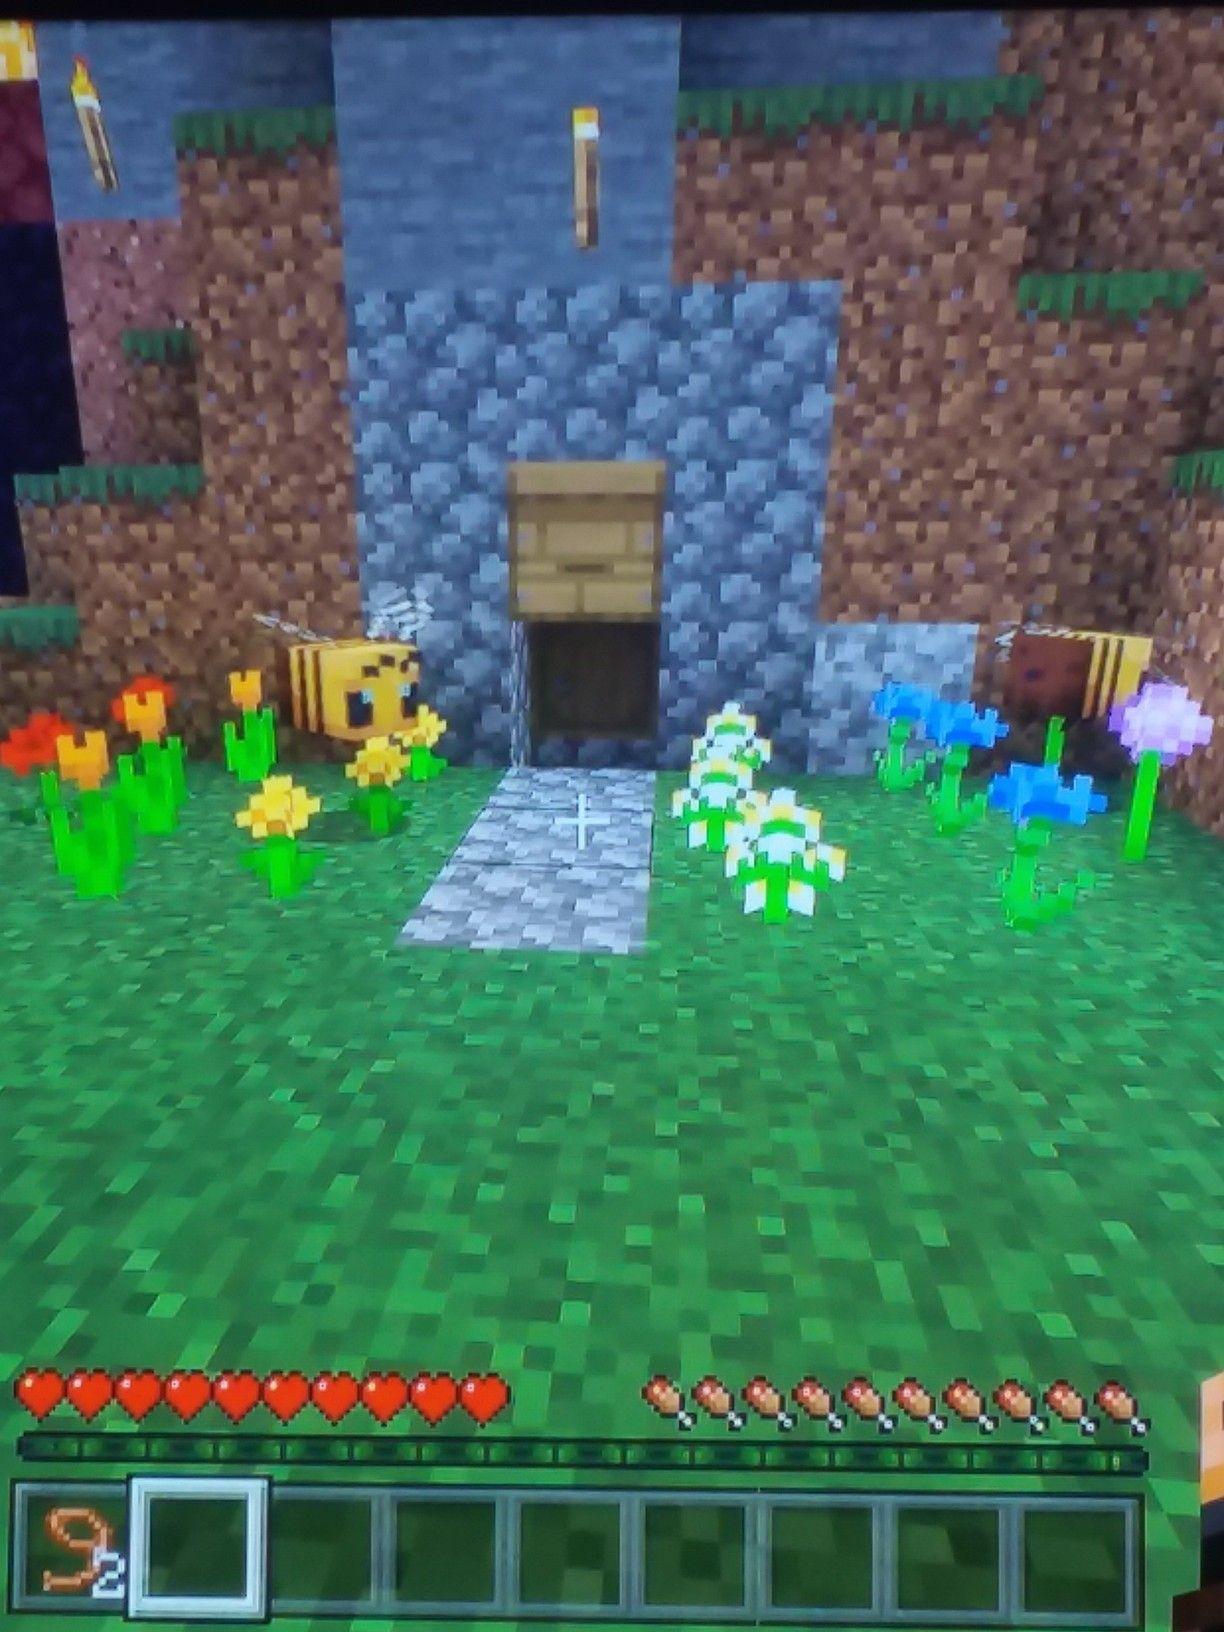 Pin by Ranger Redrage on Minecraft | Bee farm, Minecraft, Bee